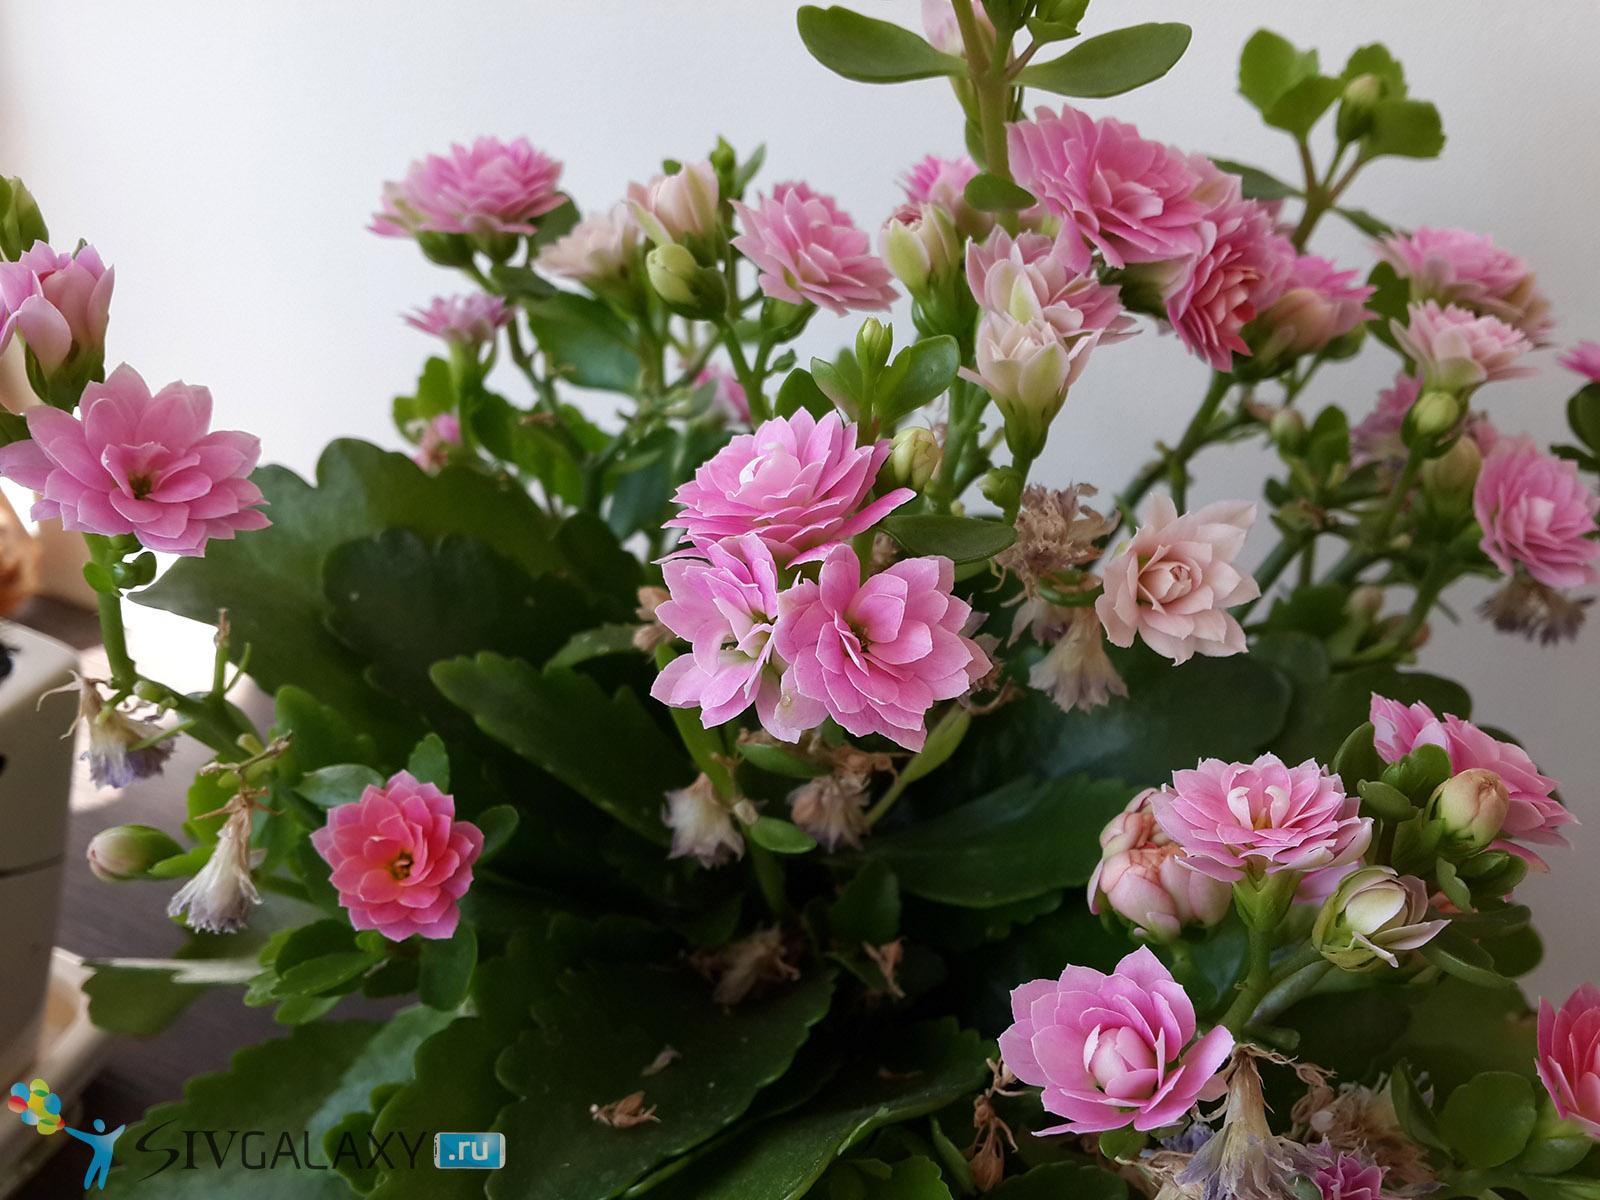 Цветы - фото с камеры Samsung Galaxy S4